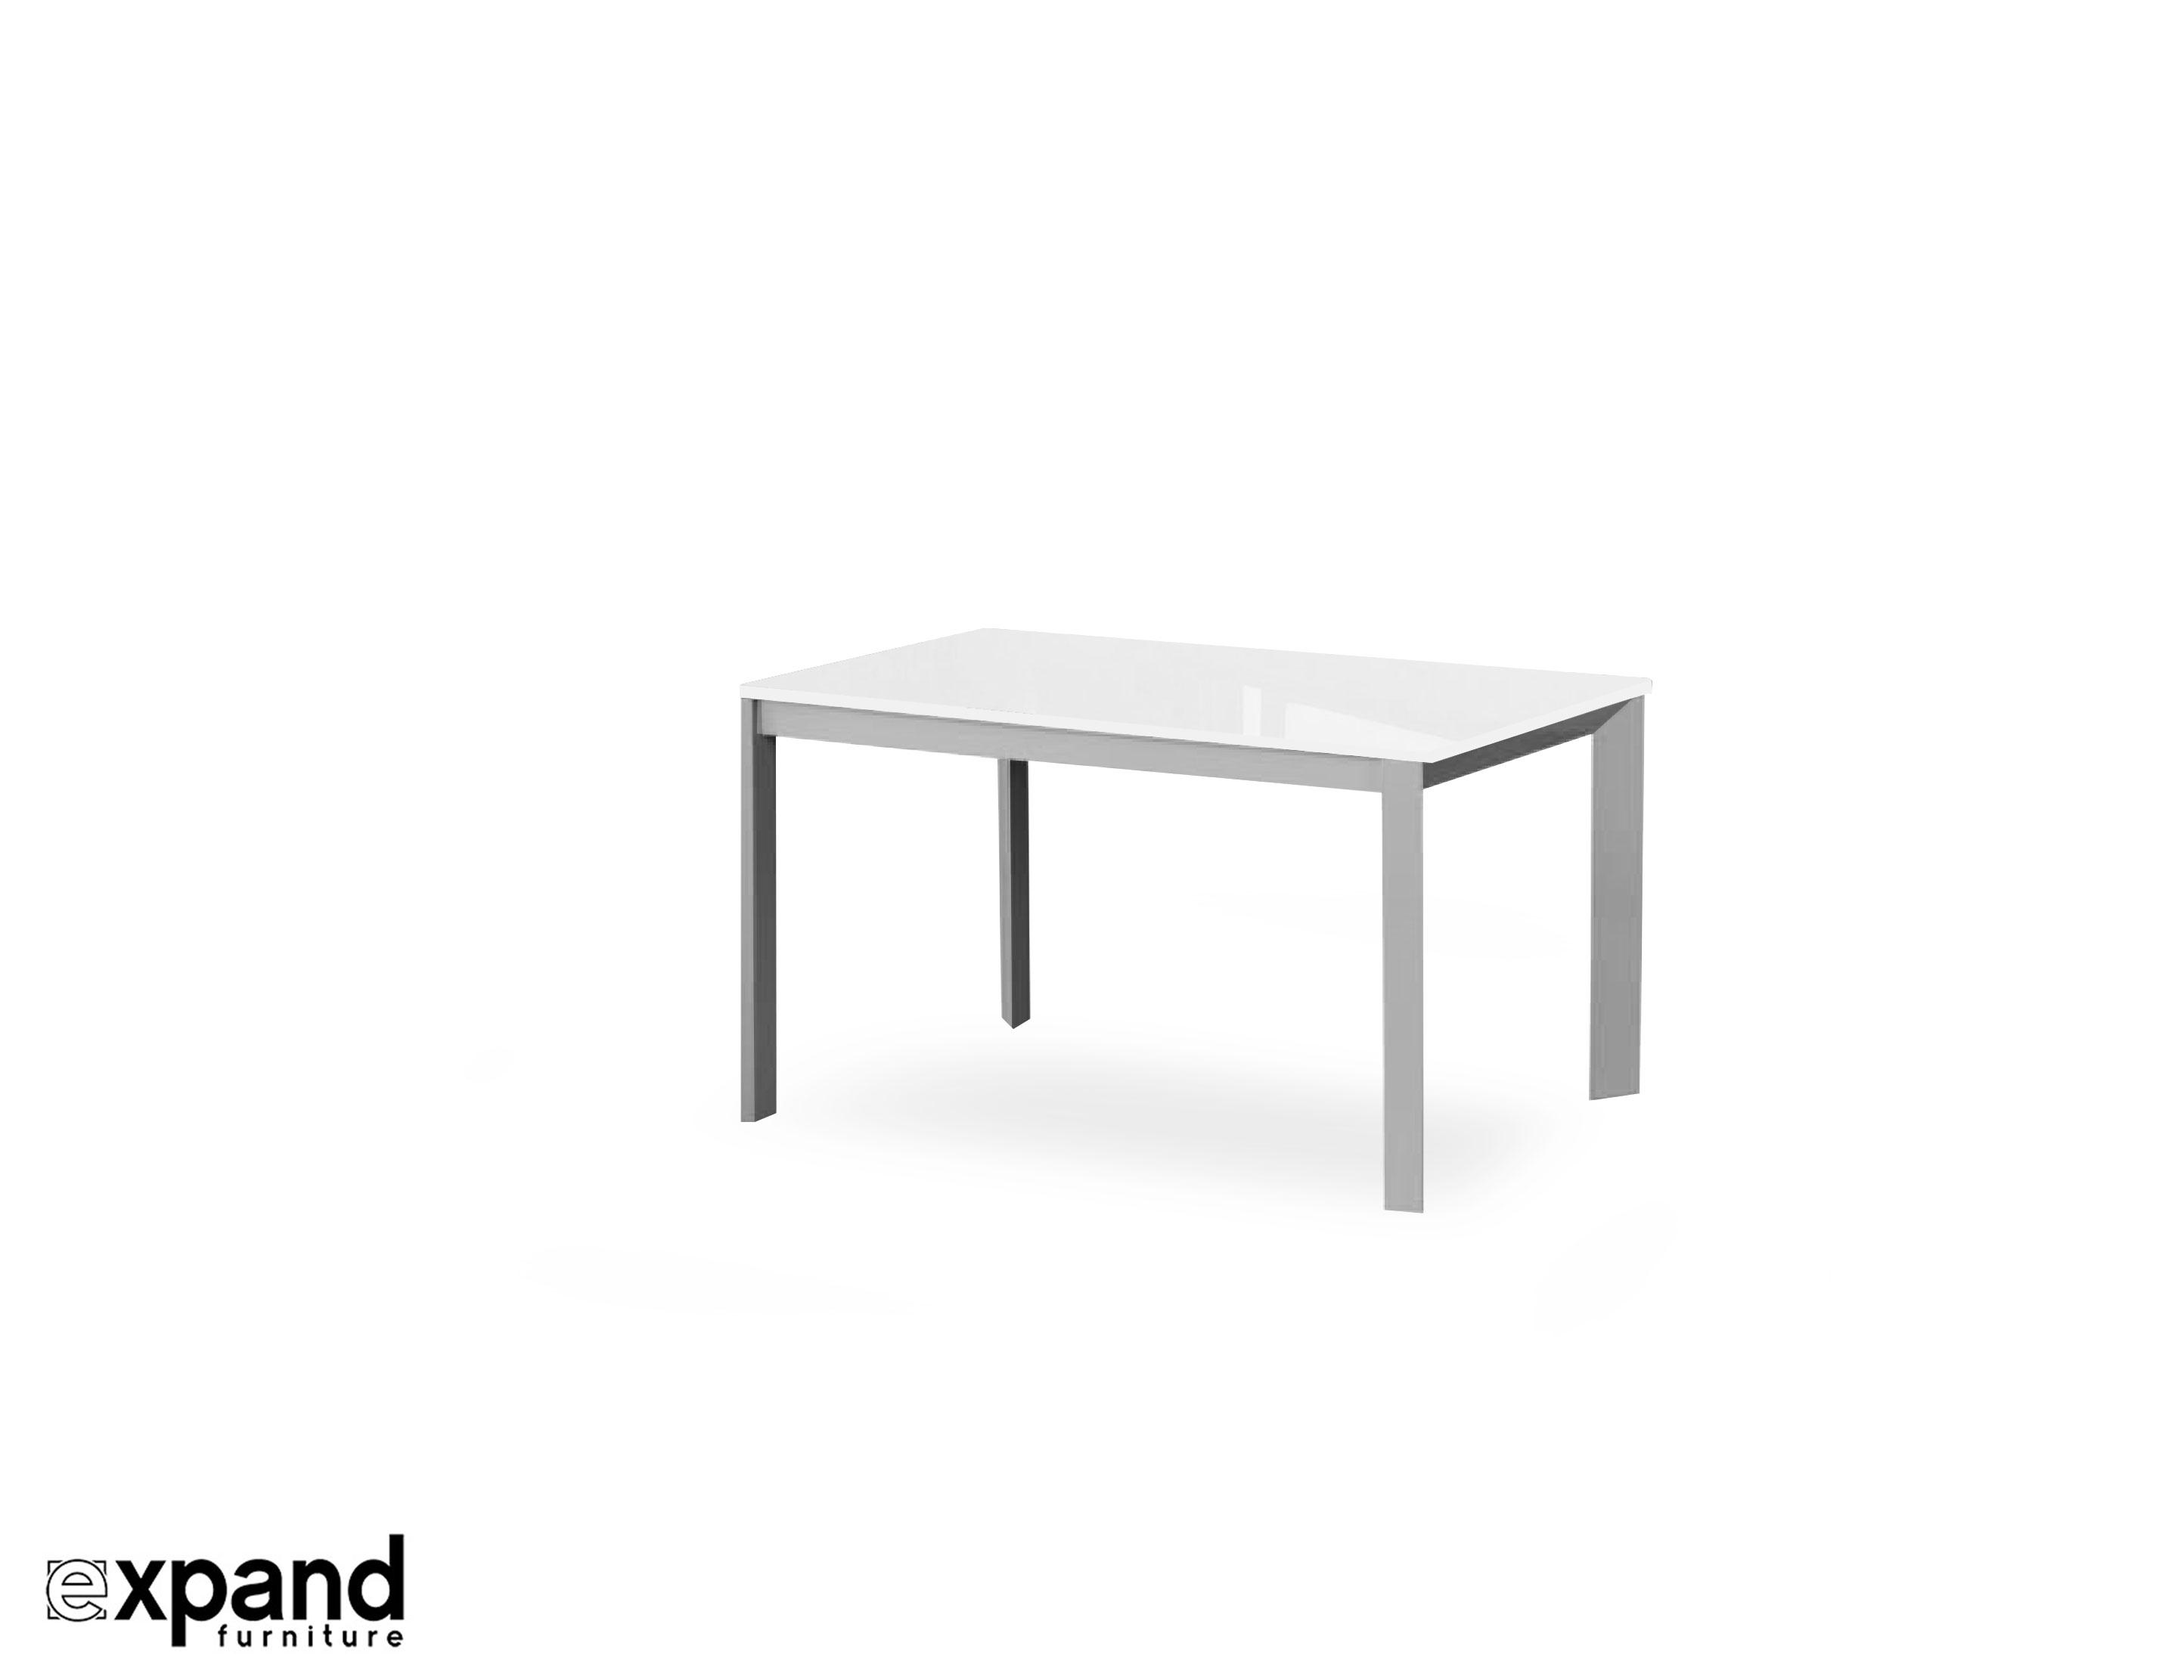 Abode Extending Table In White